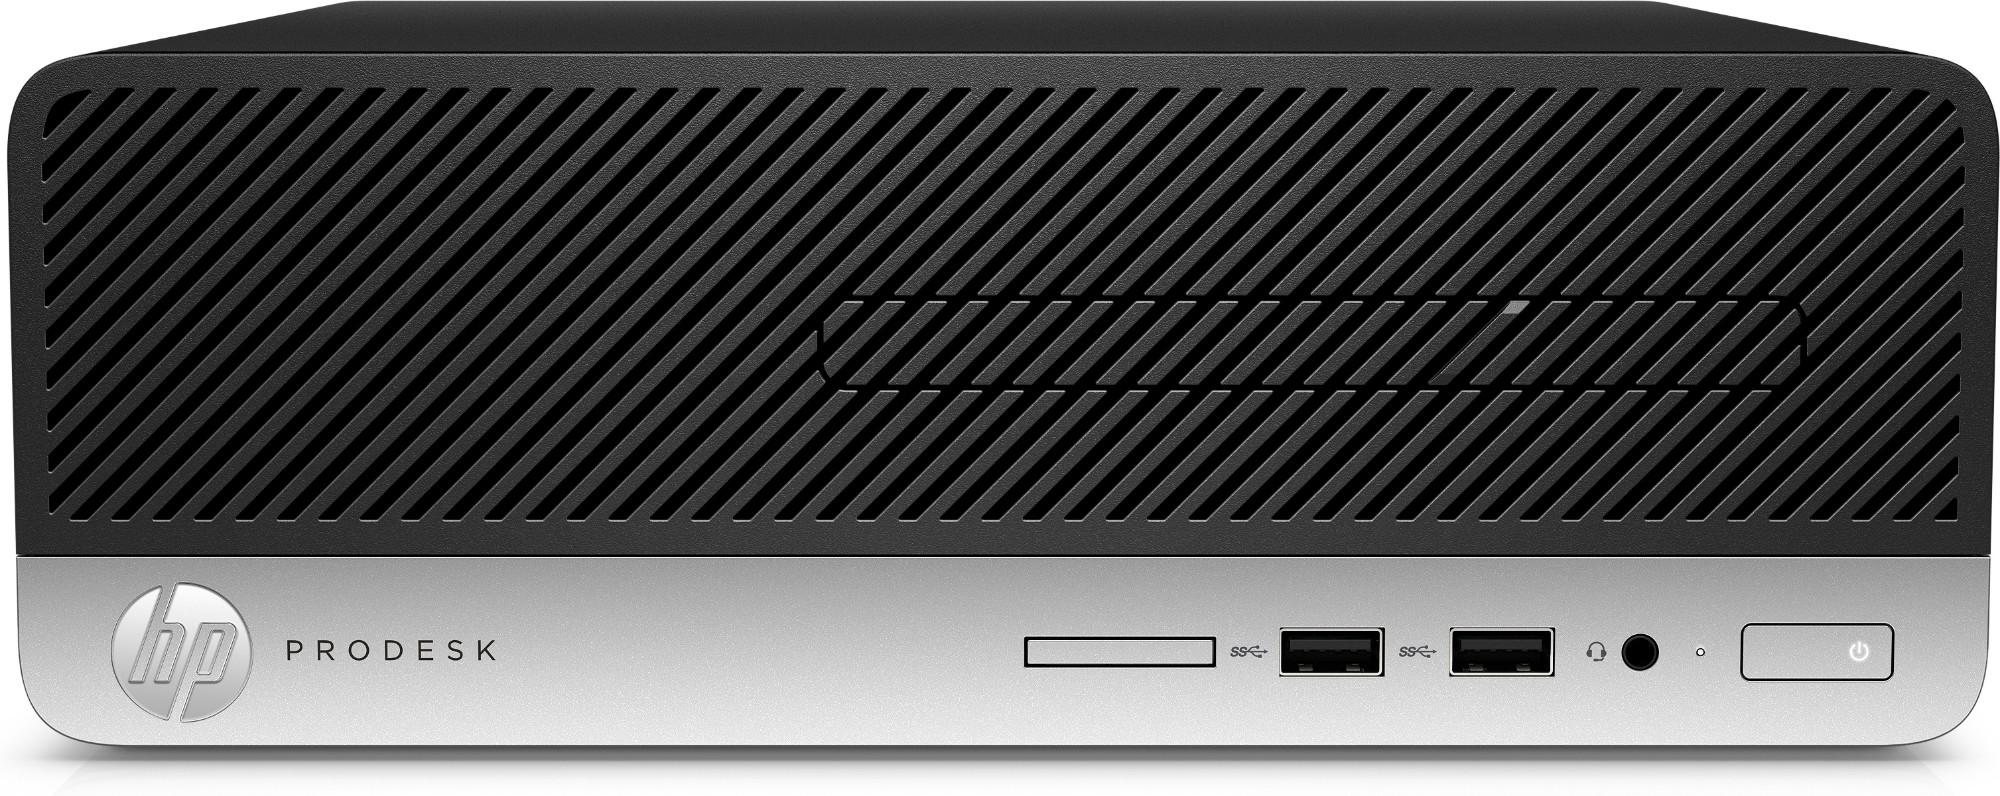 HP ProDesk 400 G6 9na generación de procesadores Intel® Core™ i3 i3-9100 8 GB DDR4-SDRAM 256 GB SSD SFF Negro PC Windows 10 Pro